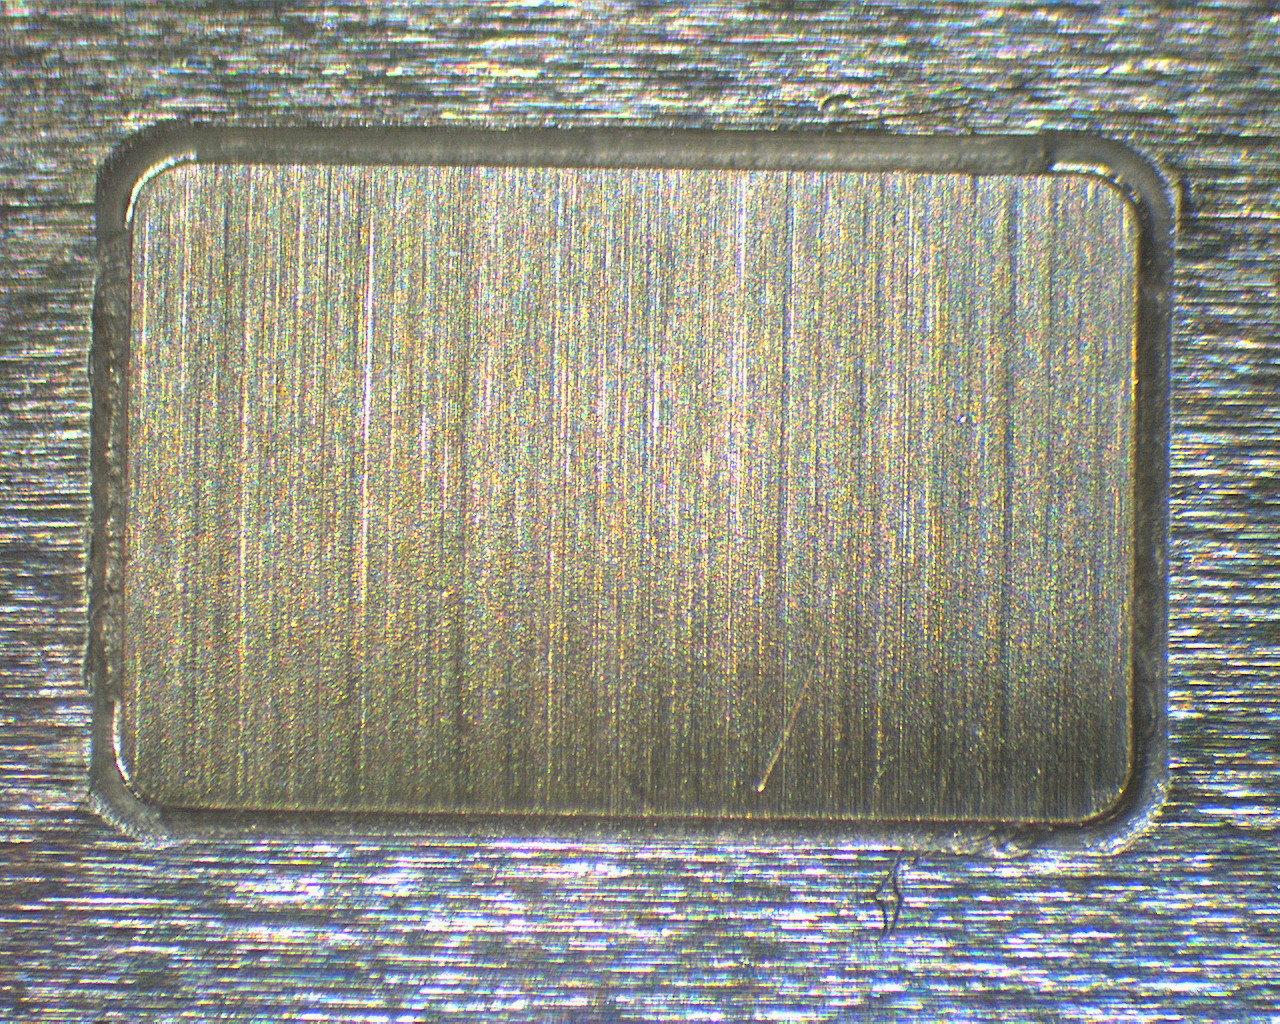 Laserfeinschweißen Elektronikindustrie